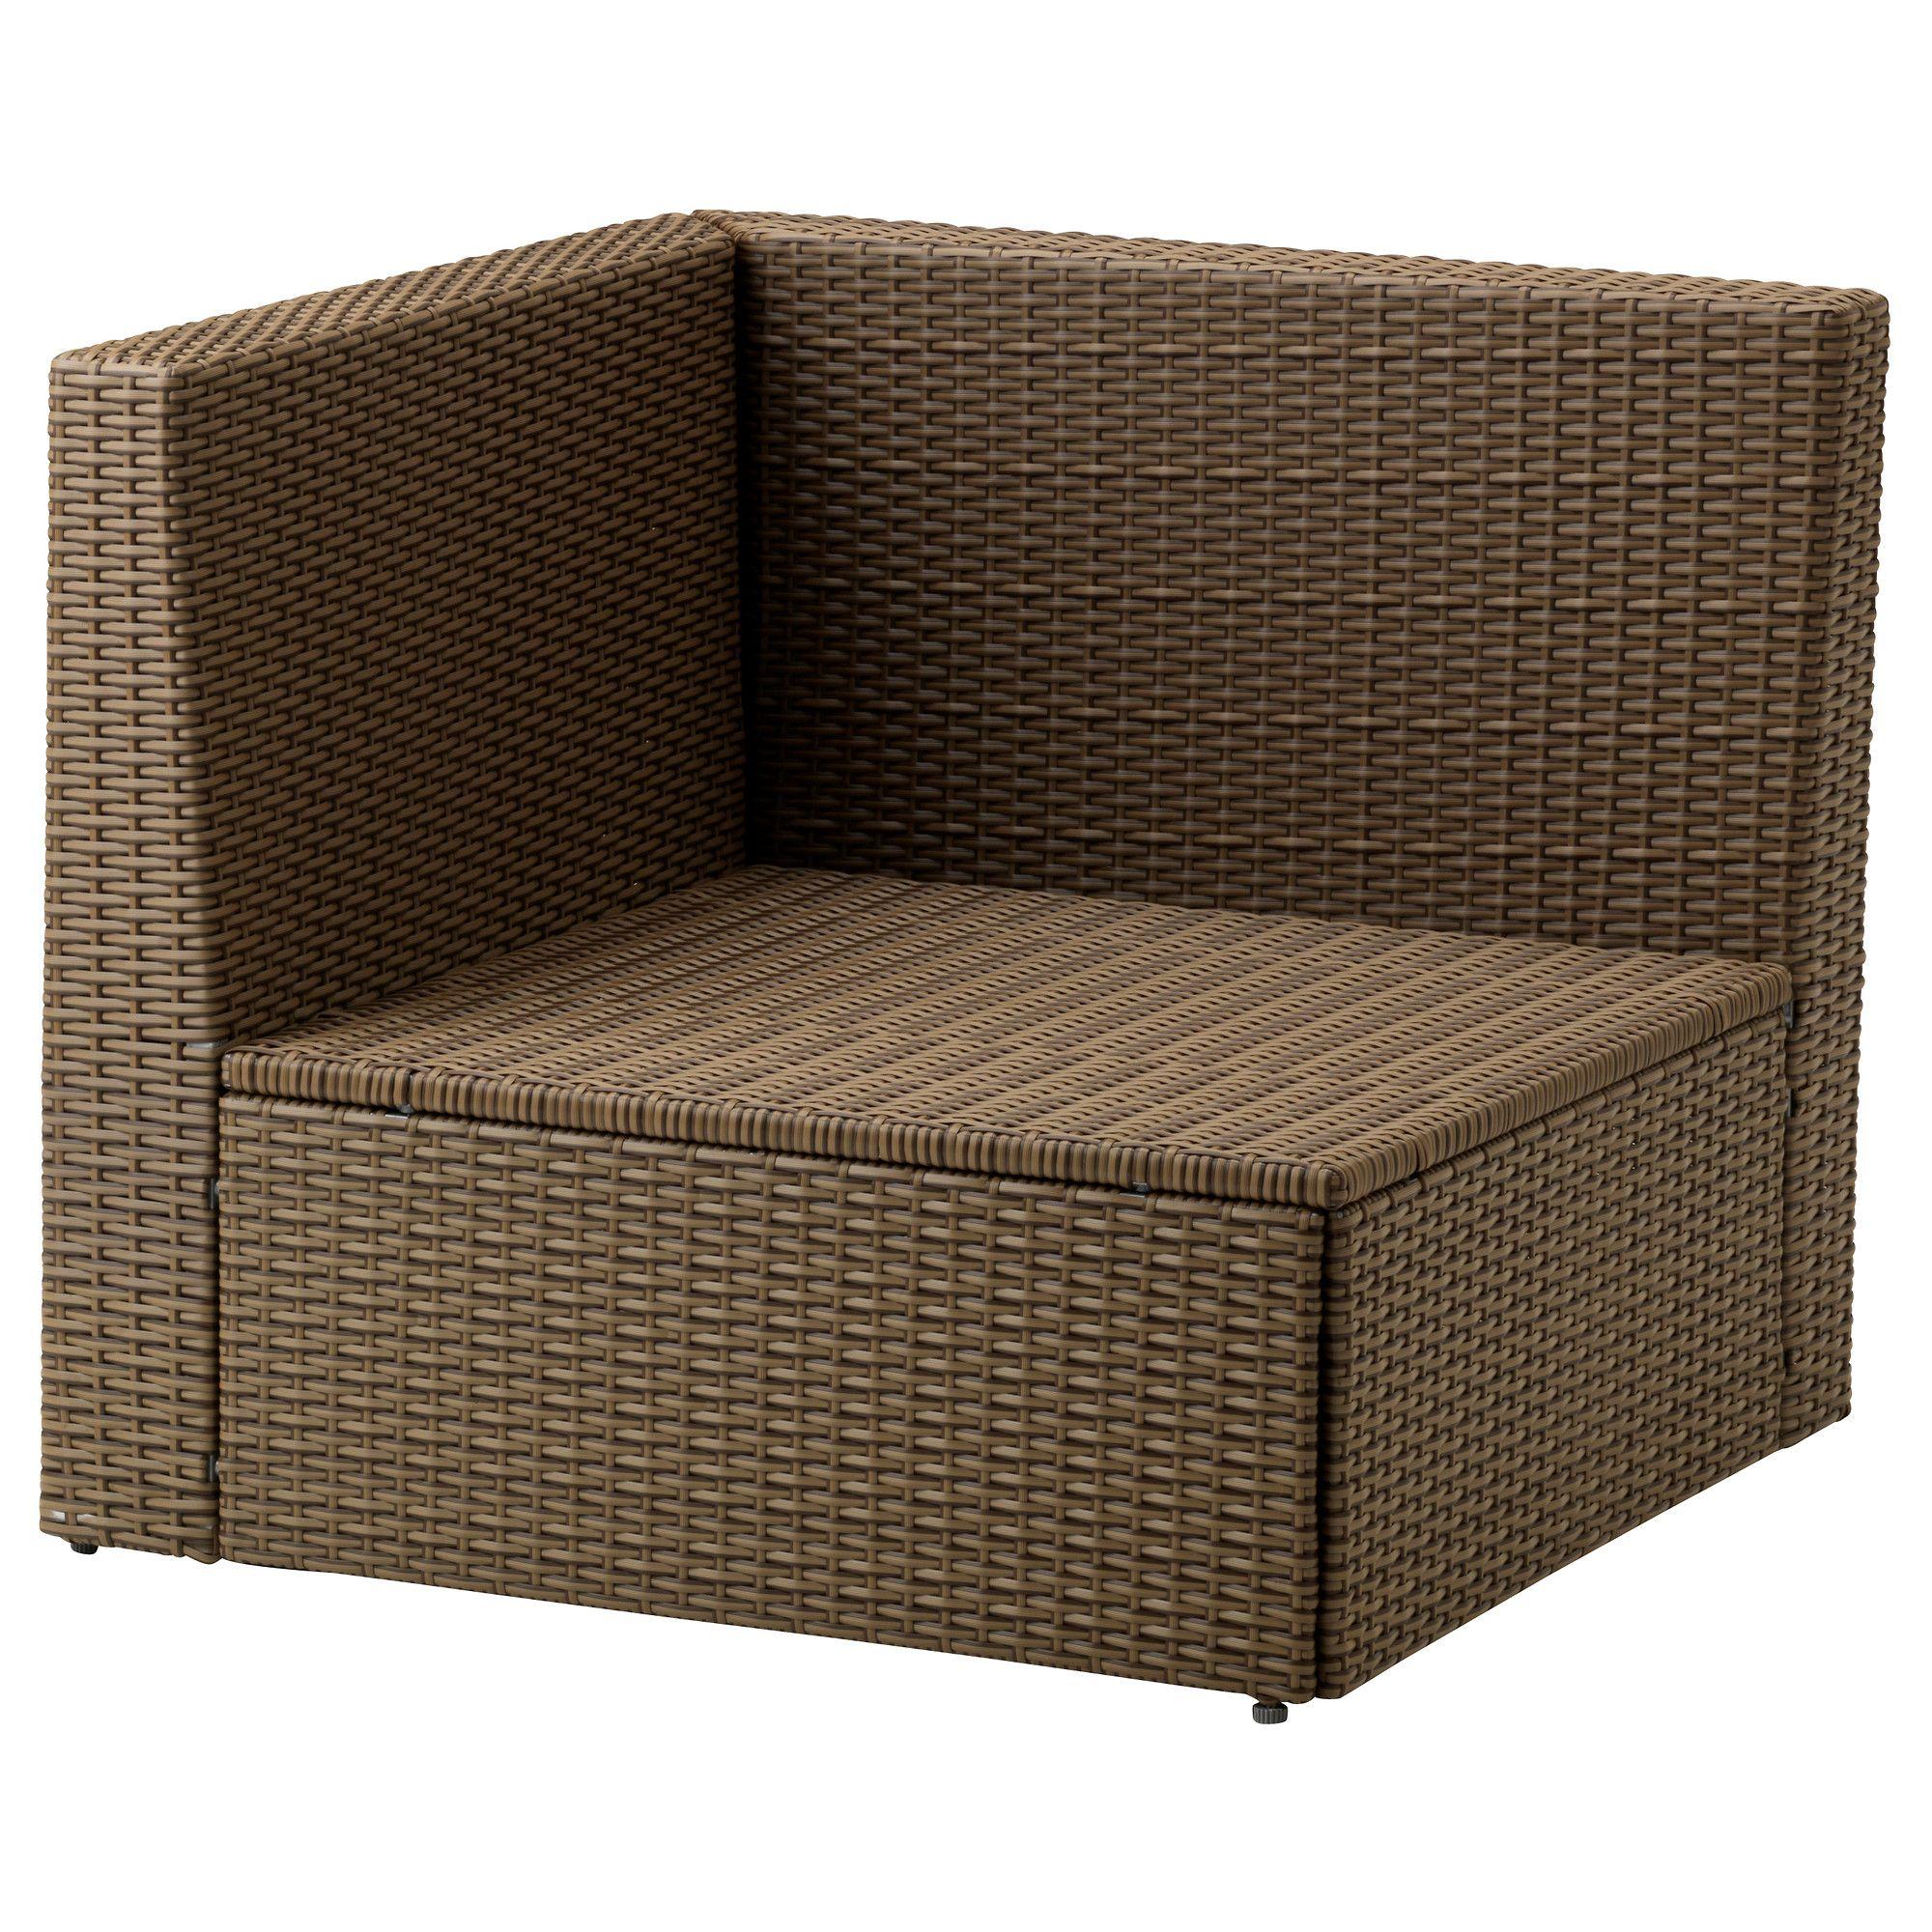 Us Furniture And Home Furnishings Ikea Outdoor Ikea Outdoor